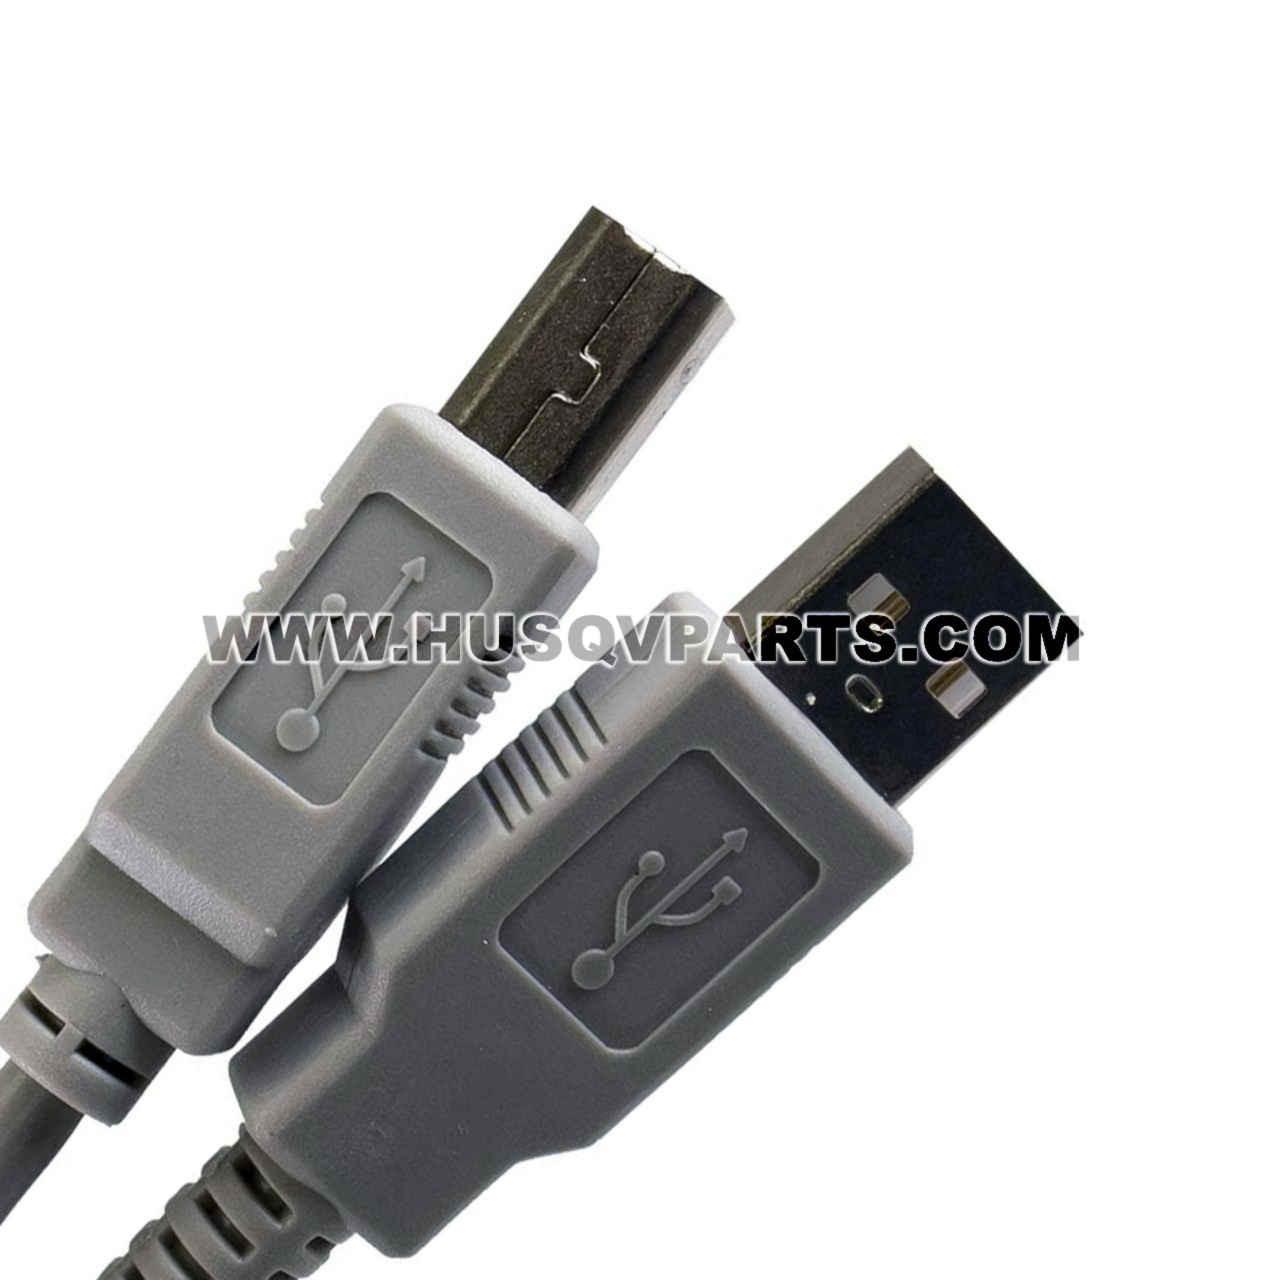 HUSQVARNA Cable White Alt Grey 577518102 Image 2